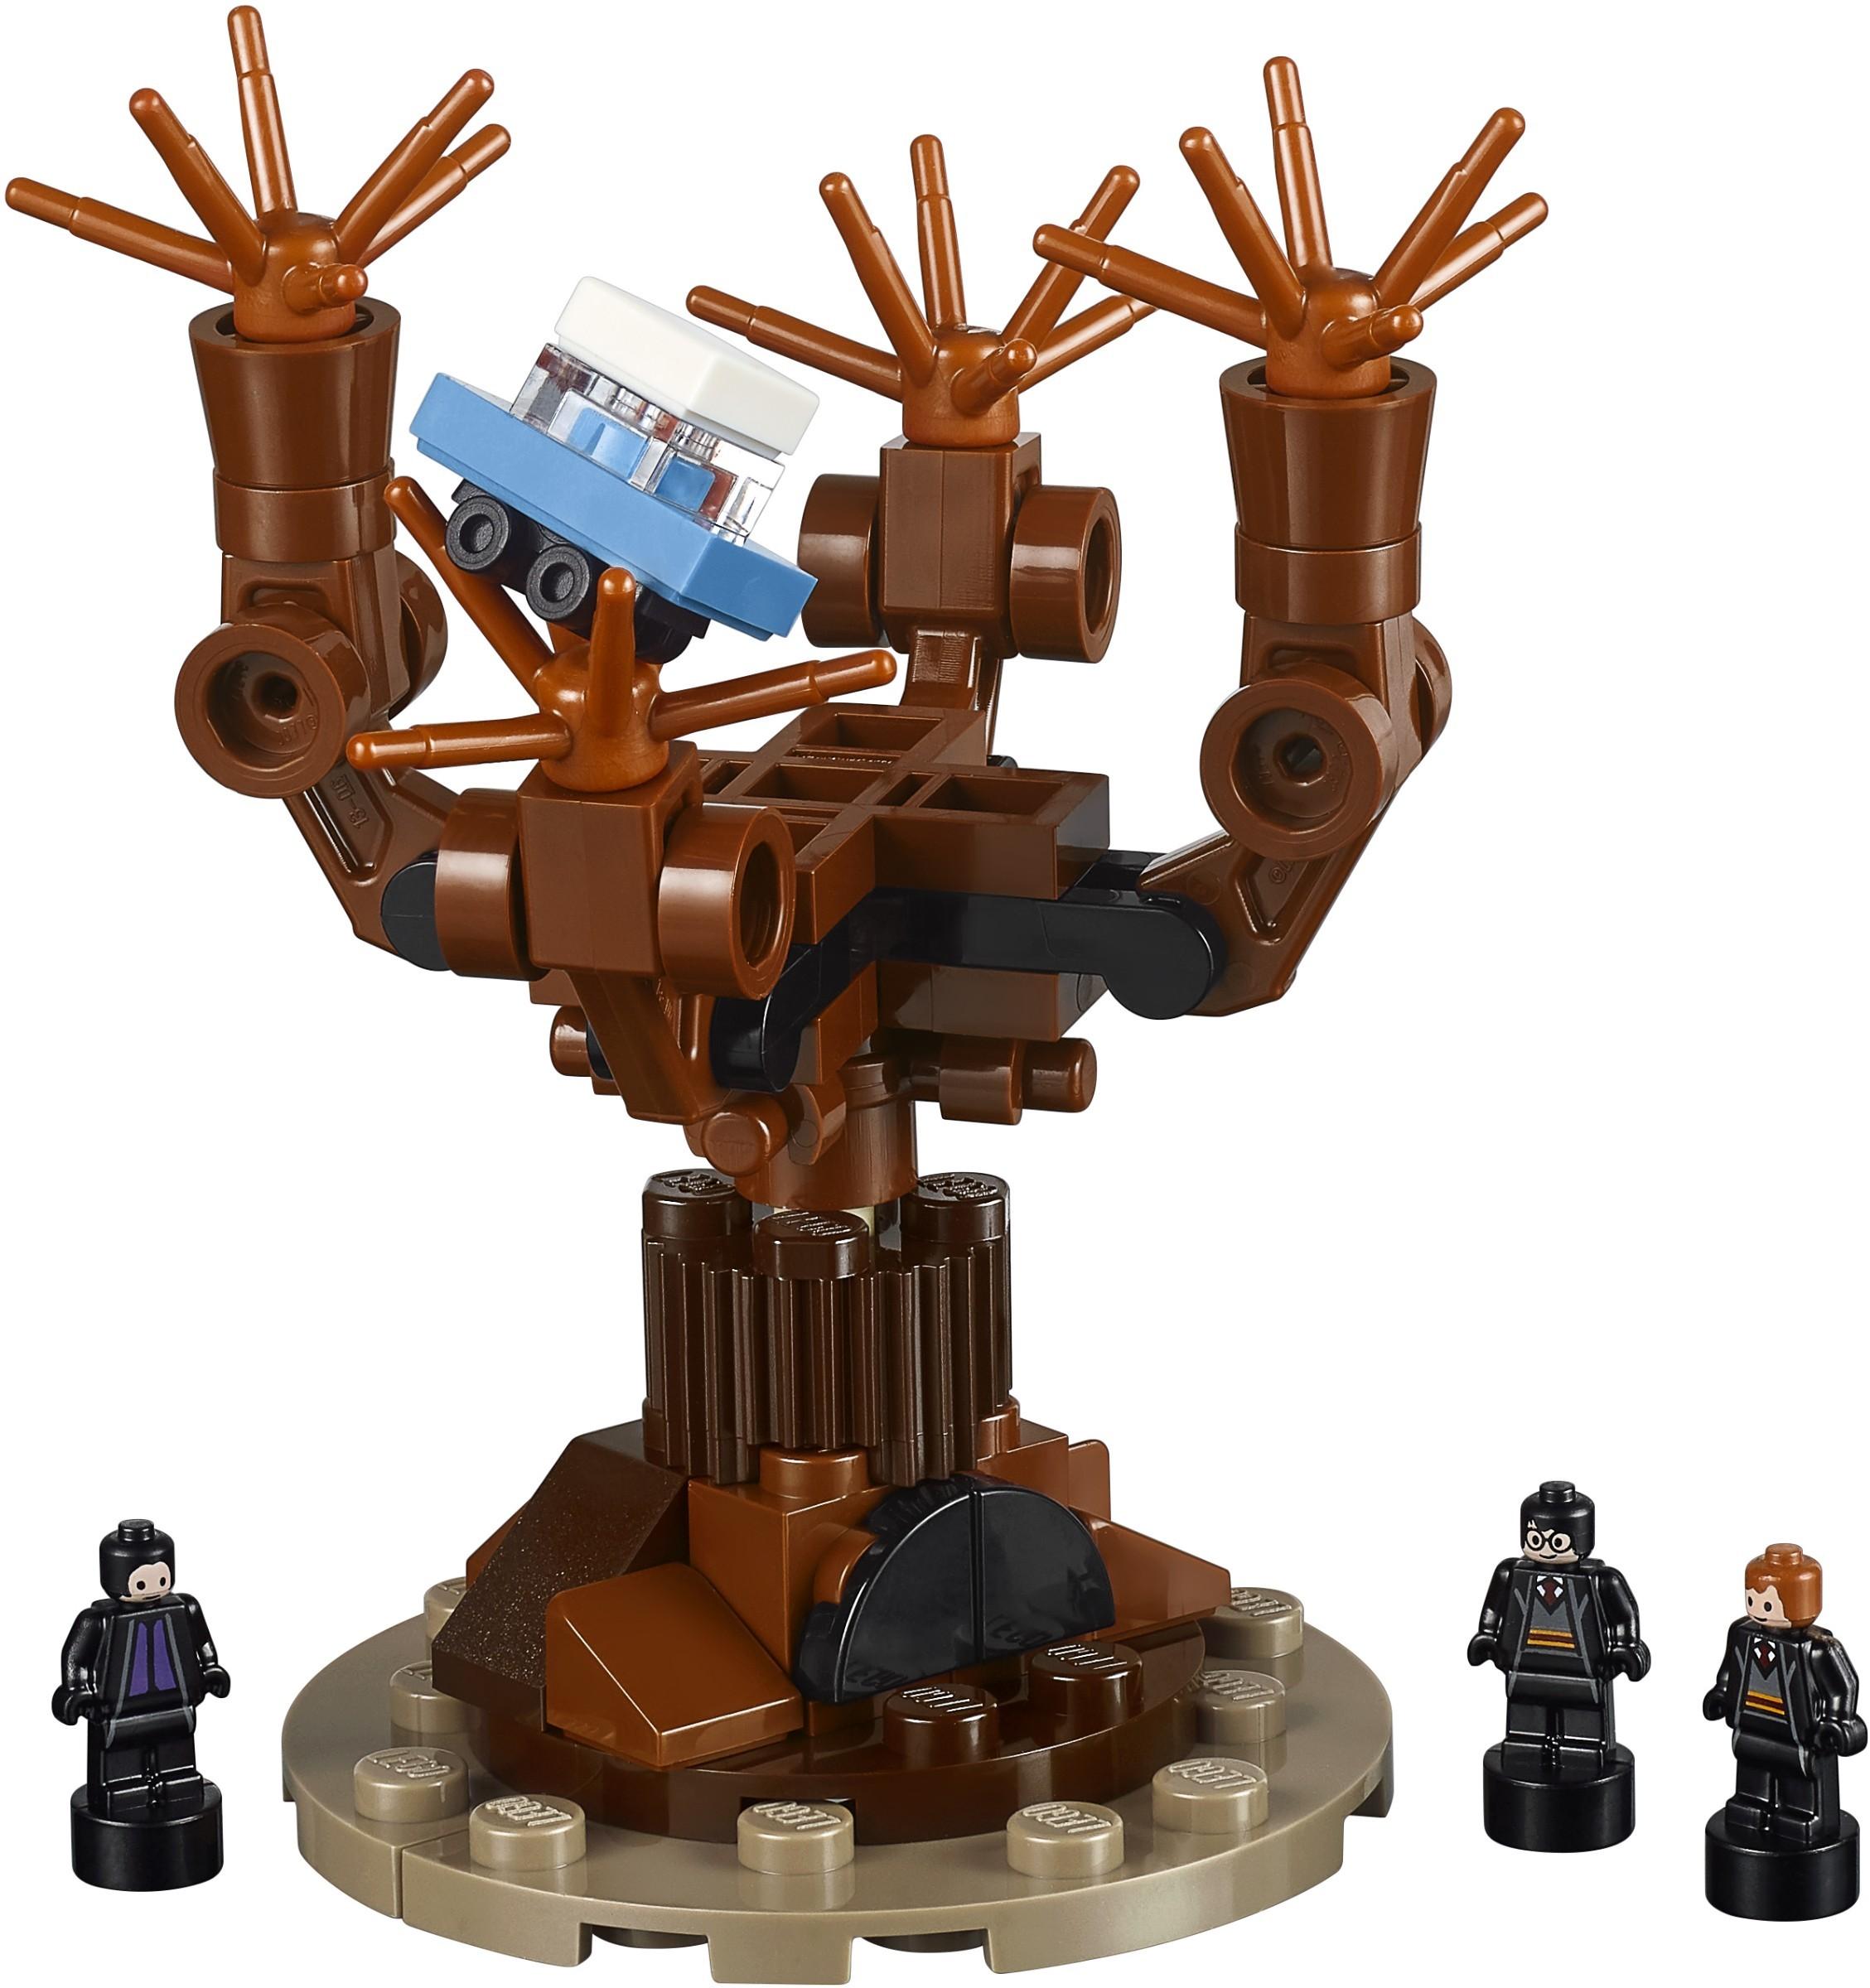 lego-harry-potter-hogwarts-castle-71043-mikrofigur-baum-2018 zusammengebaut.com